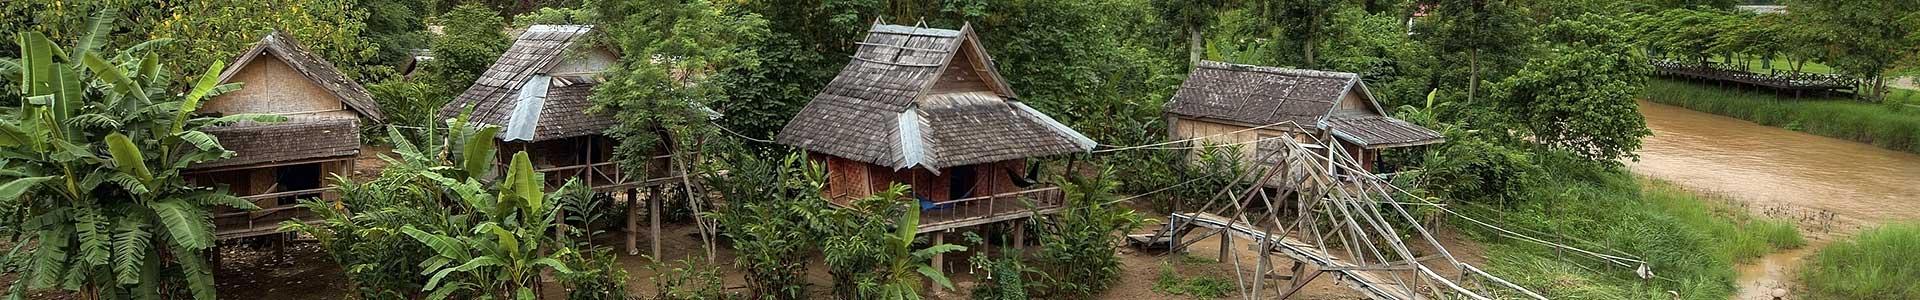 Voyage au Laos - TUI